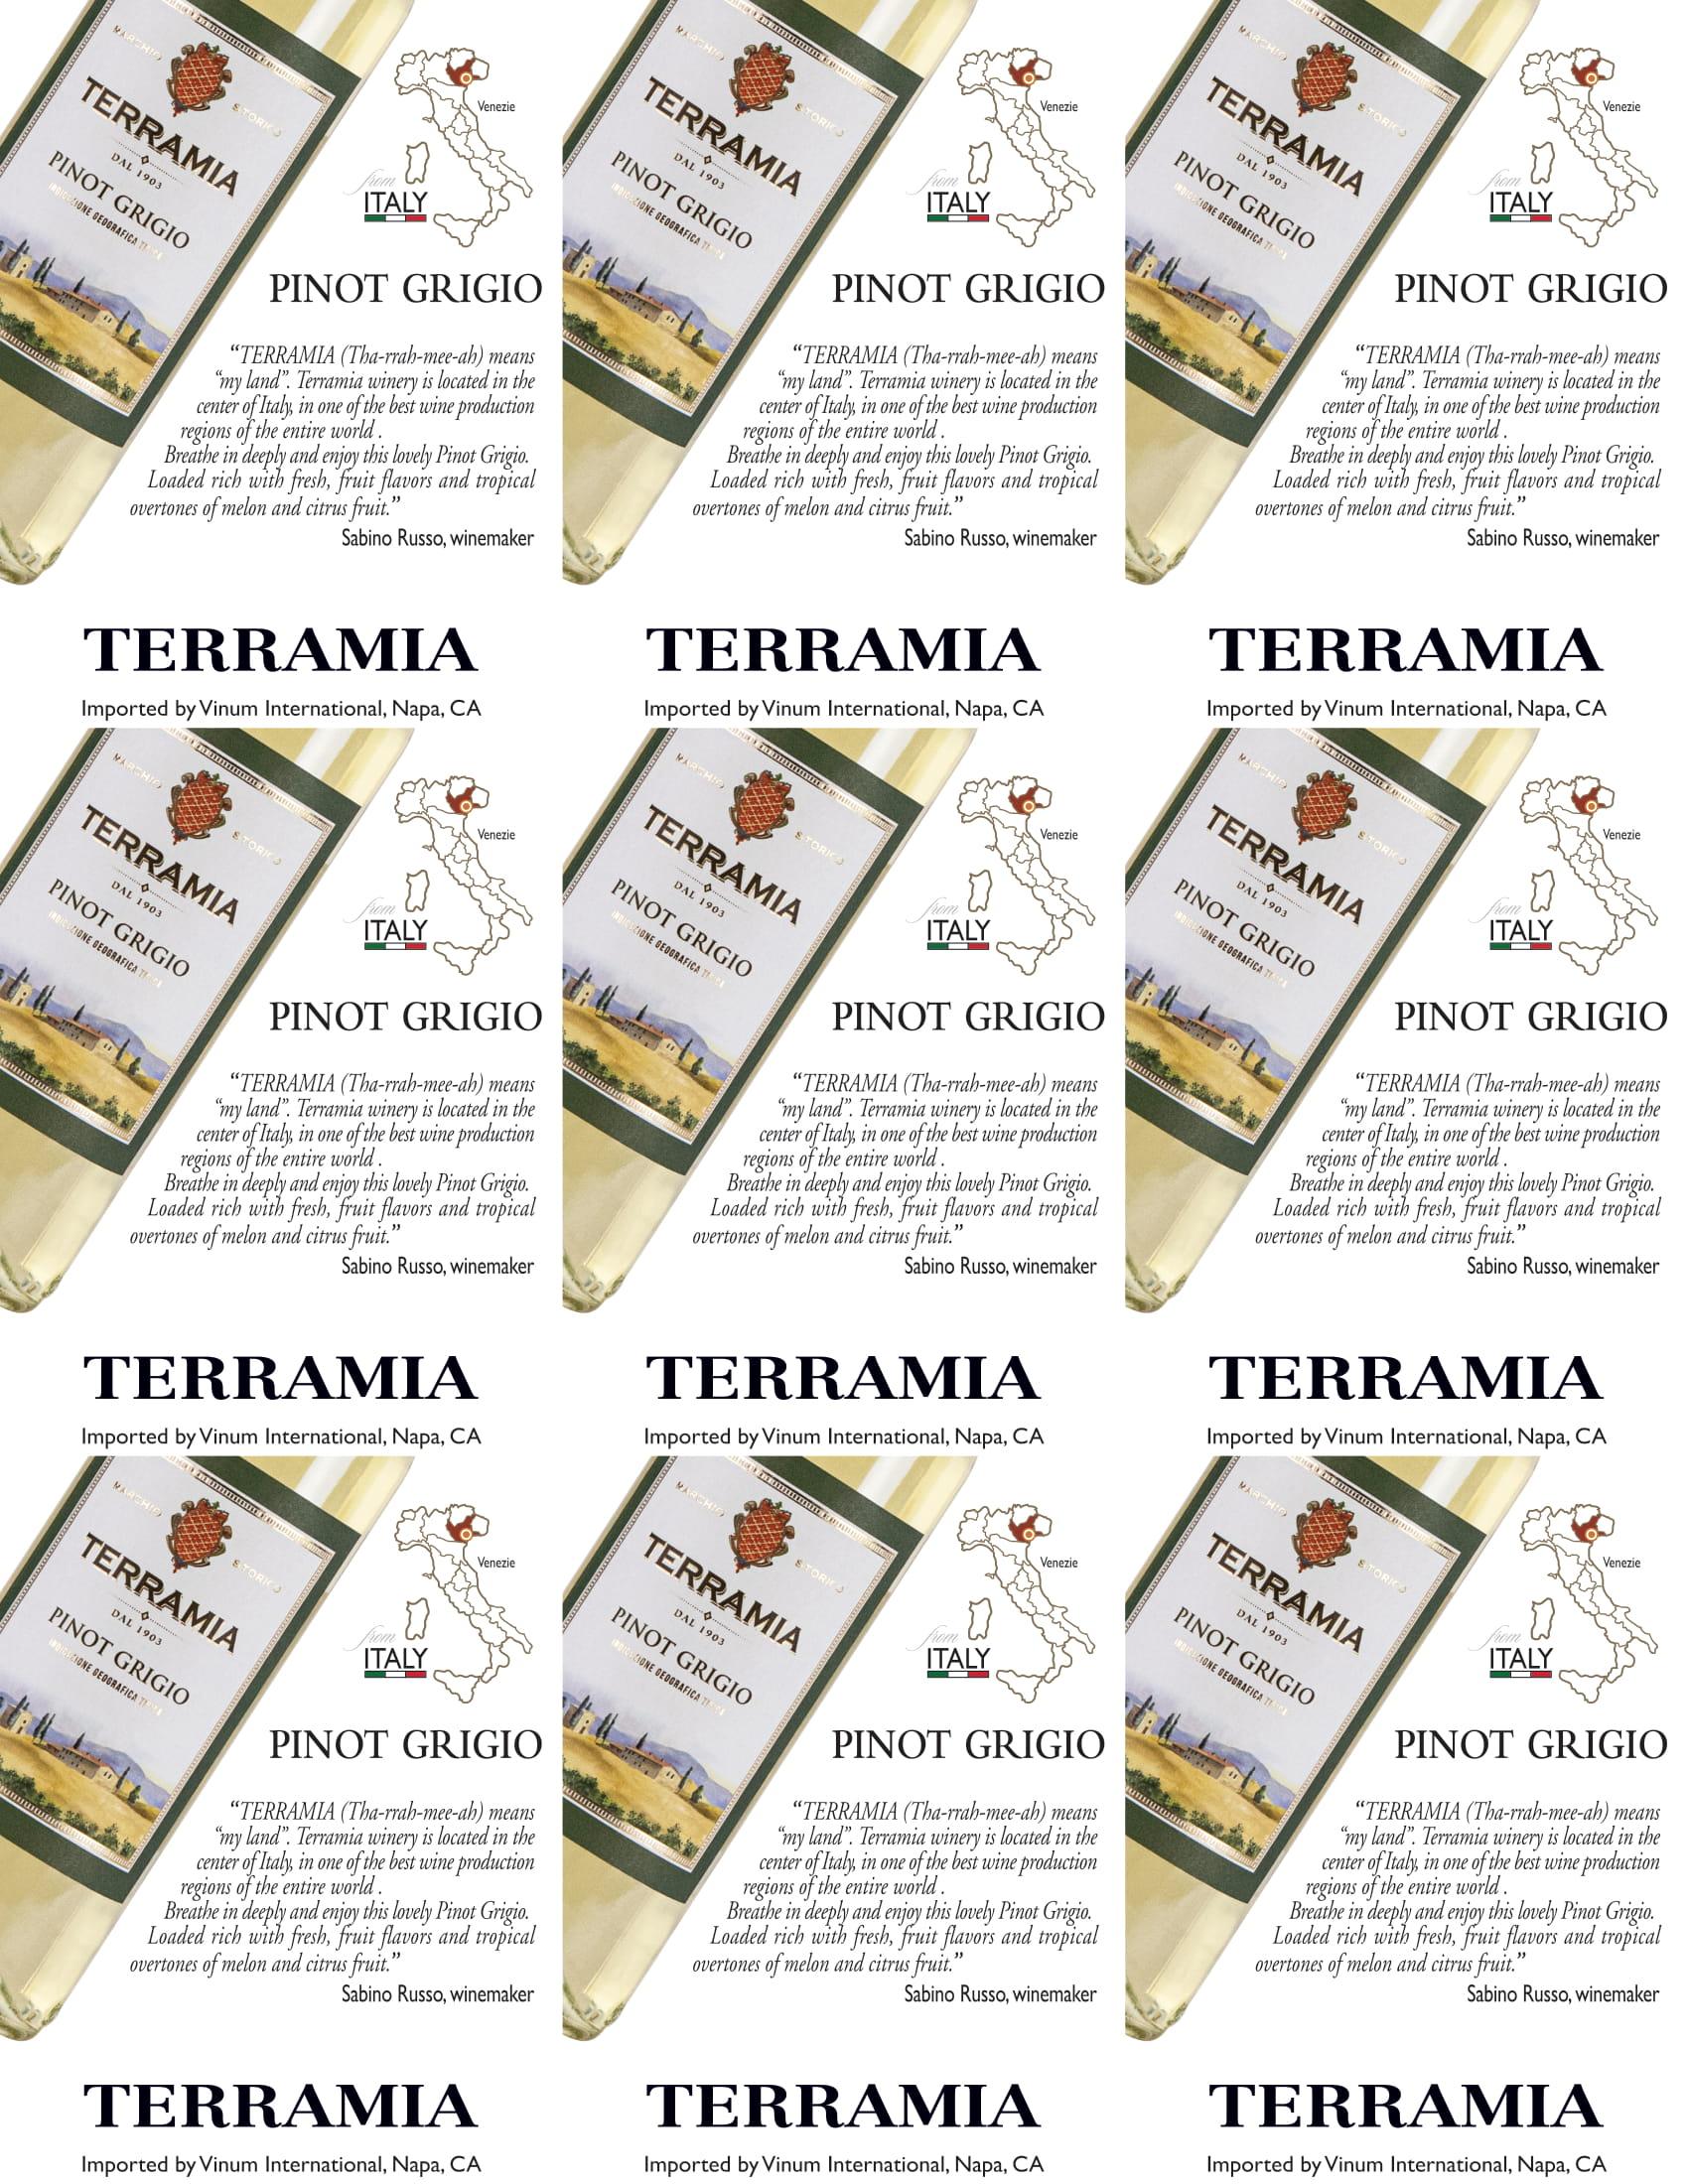 Terramia Pinot Grigio Shelf Talker